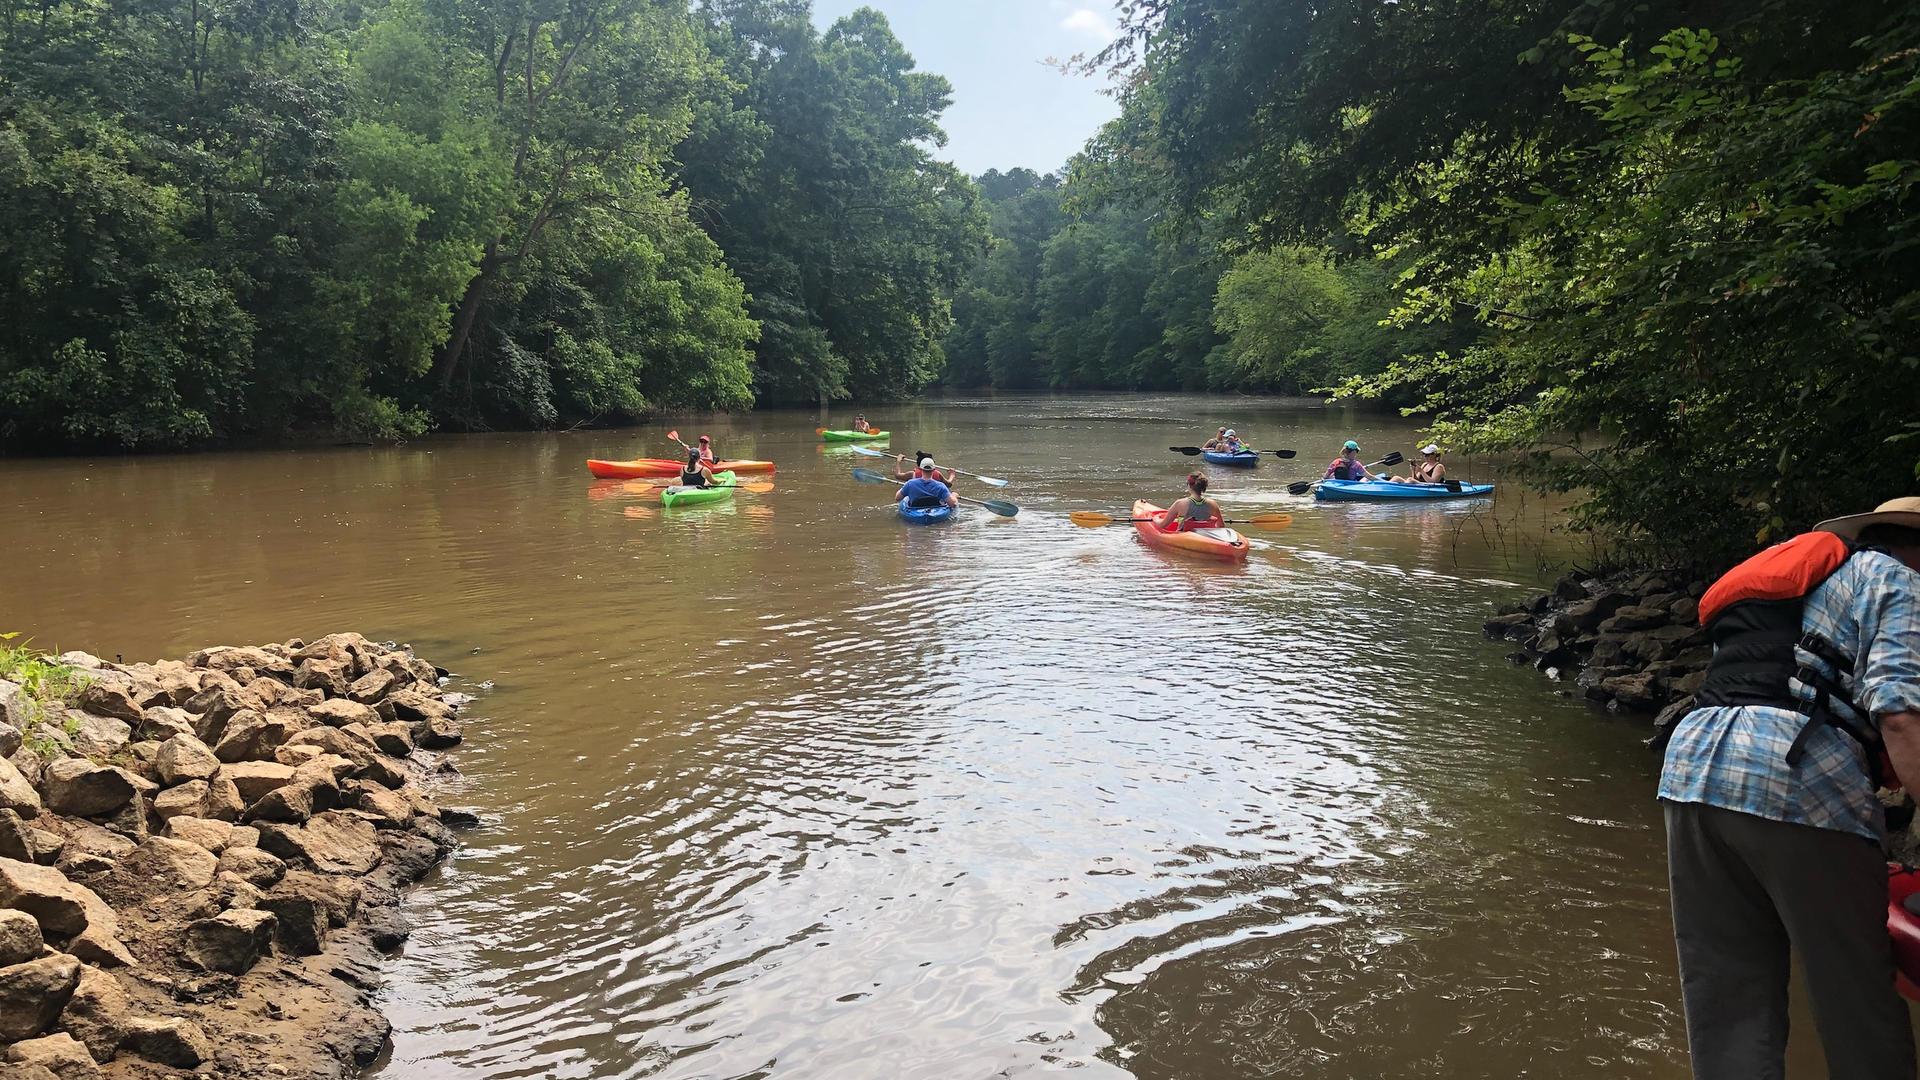 June 16, 2018 - LRWT Tour with Mill Pond Kayak